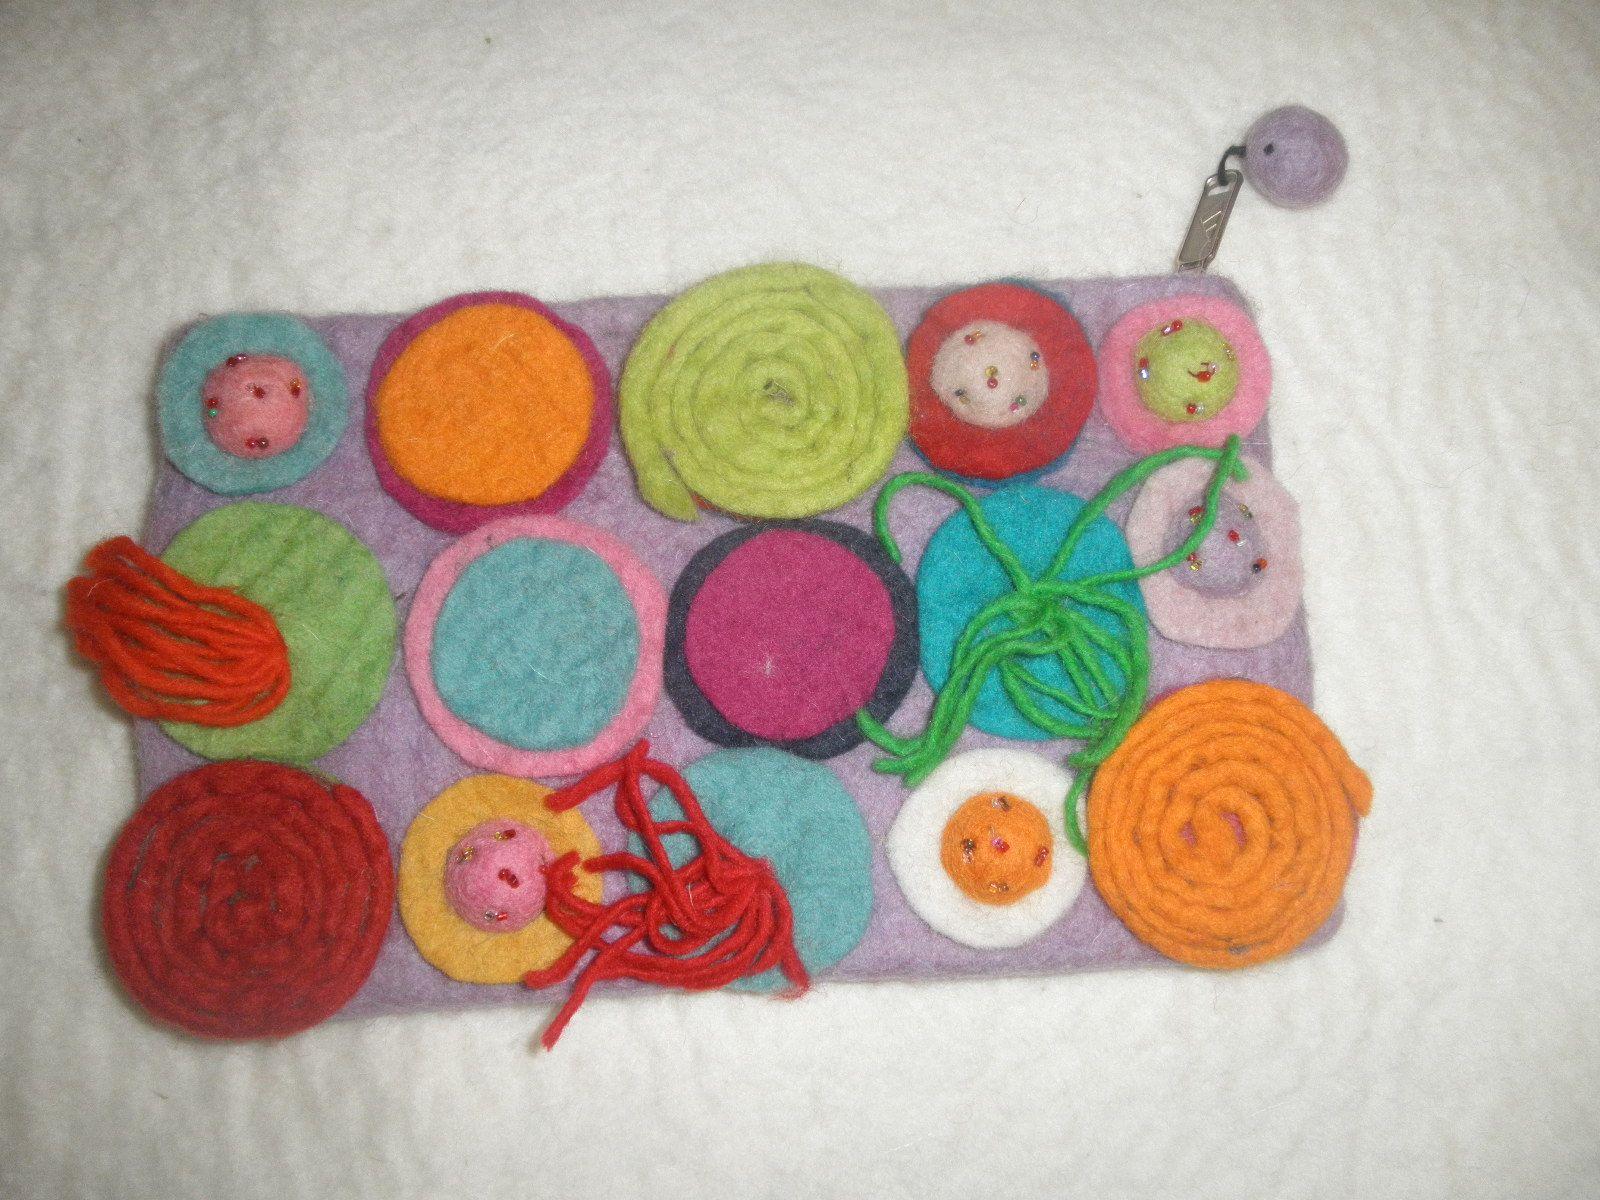 Wool Craft Ideas For Kids Part - 18: Felt Wool DIY U0026 Crafts Felt Wool Craft Handicraft Felt Craft Supplies Felt  Craft Design Felt Craft Patterns Felt Craft Ideas Felt Craft For Kids Felt  Craft ...